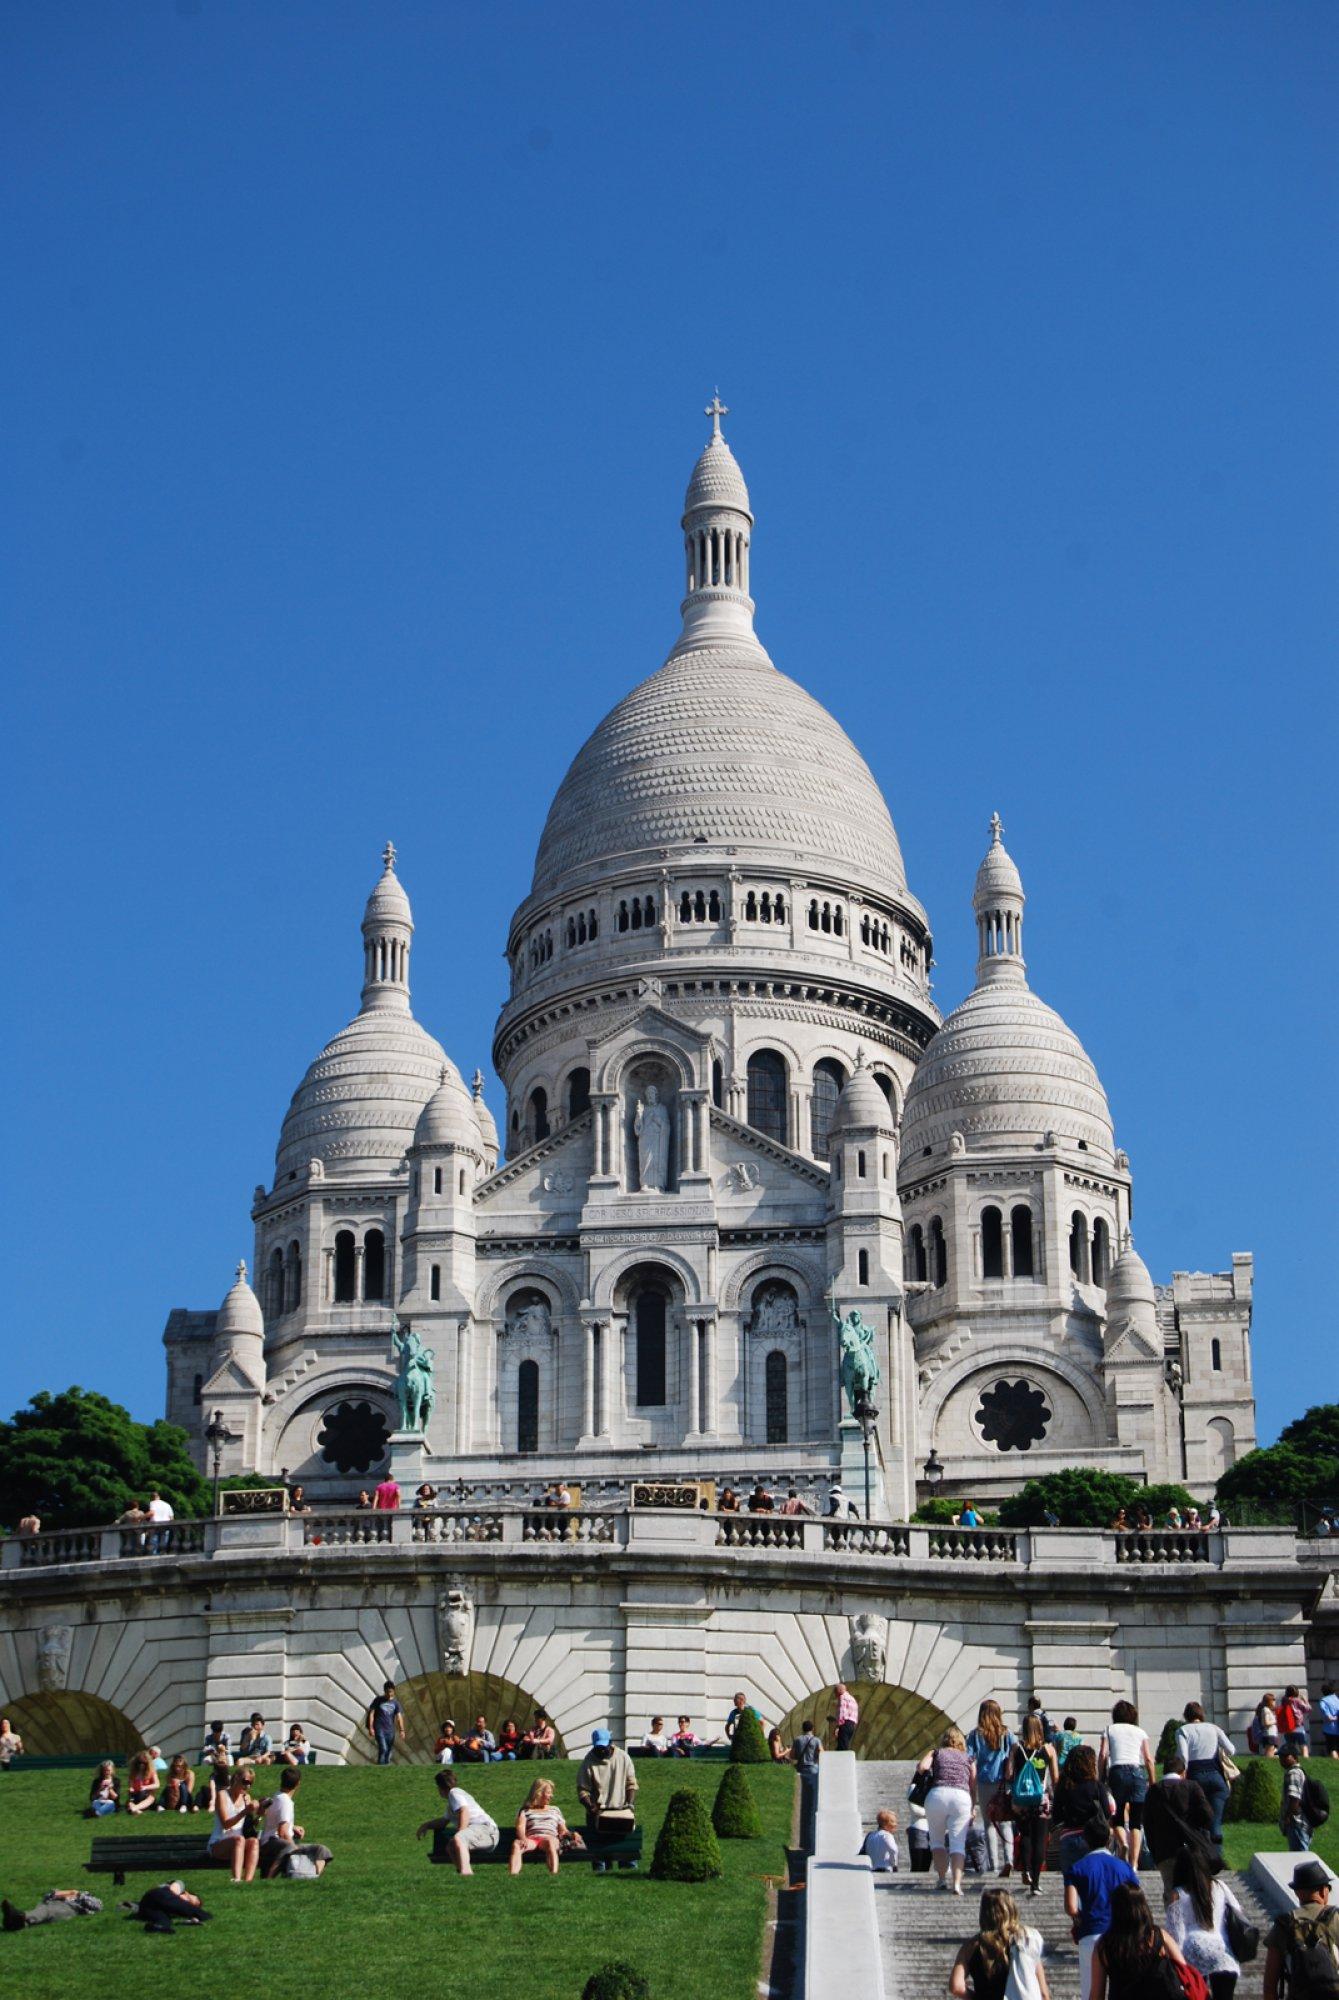 https://bubo.sk/uploads/galleries/5048/pariz-basilique-du-sacre-coeur-1-june-30-2012.jpg